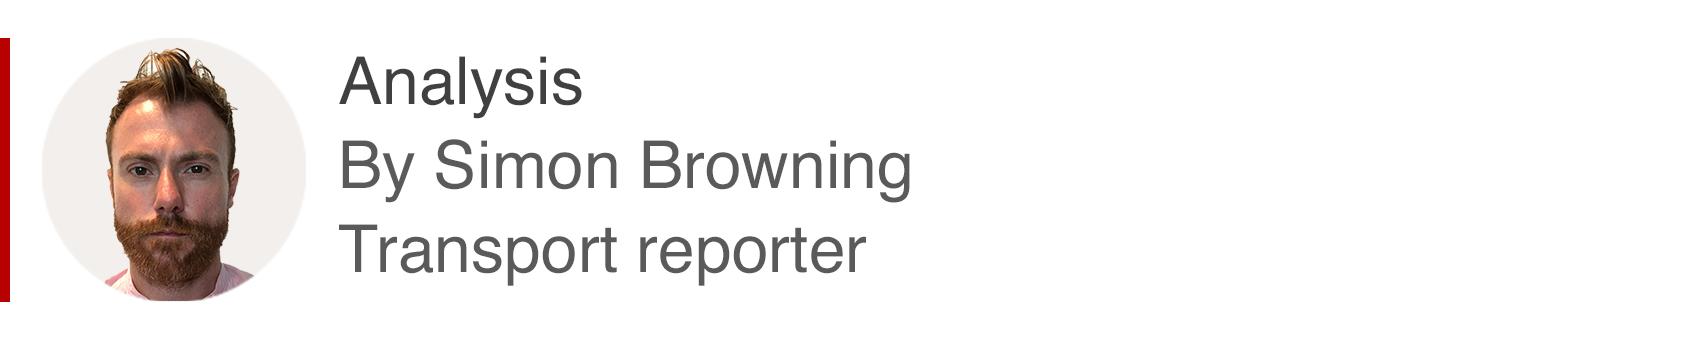 Analysis box by Simon Browning, transport reporter